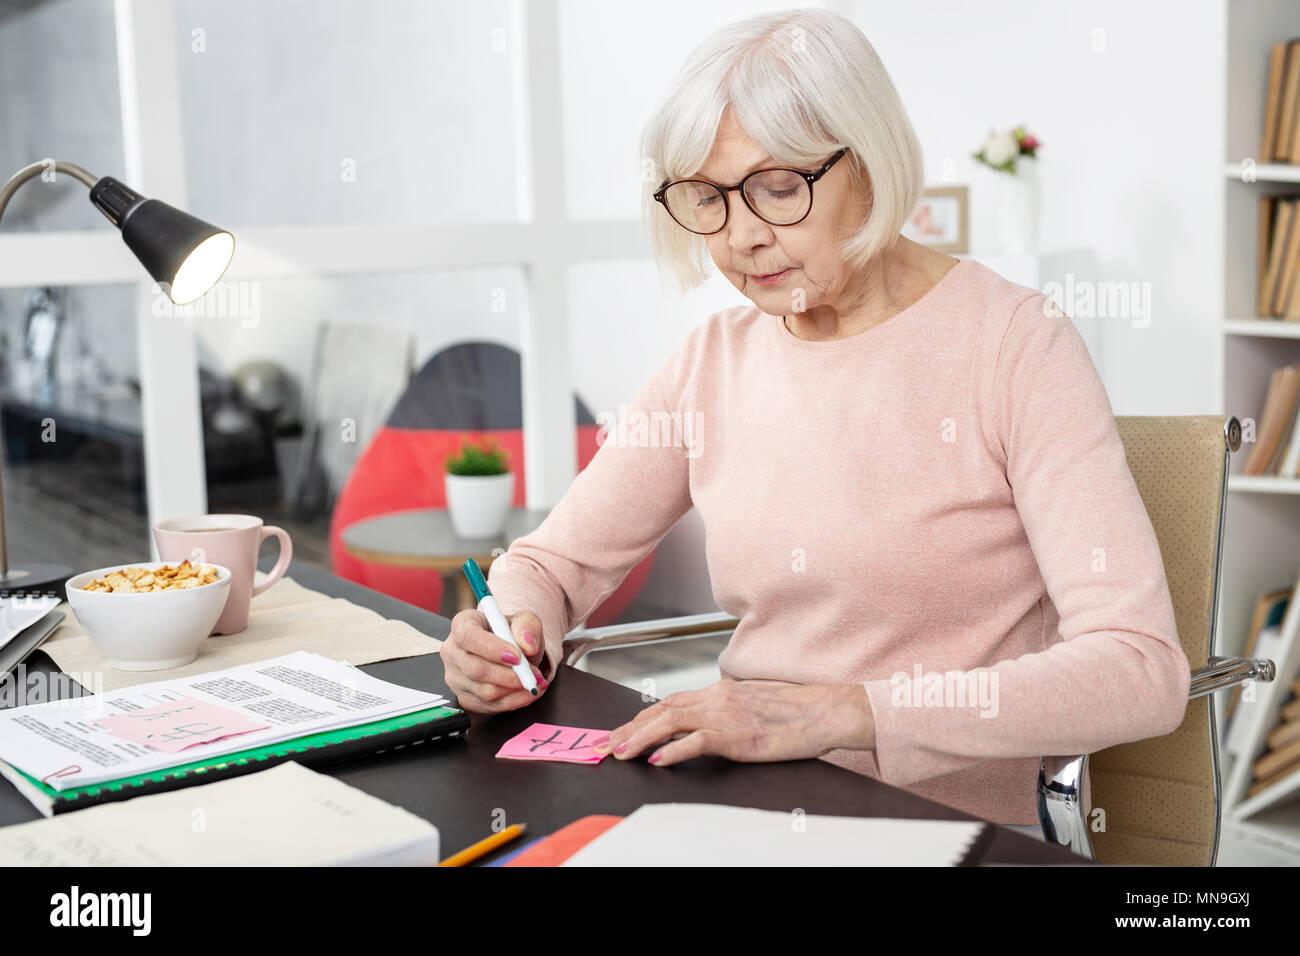 Focused mature woman drawing hieroglyph - Stock Image